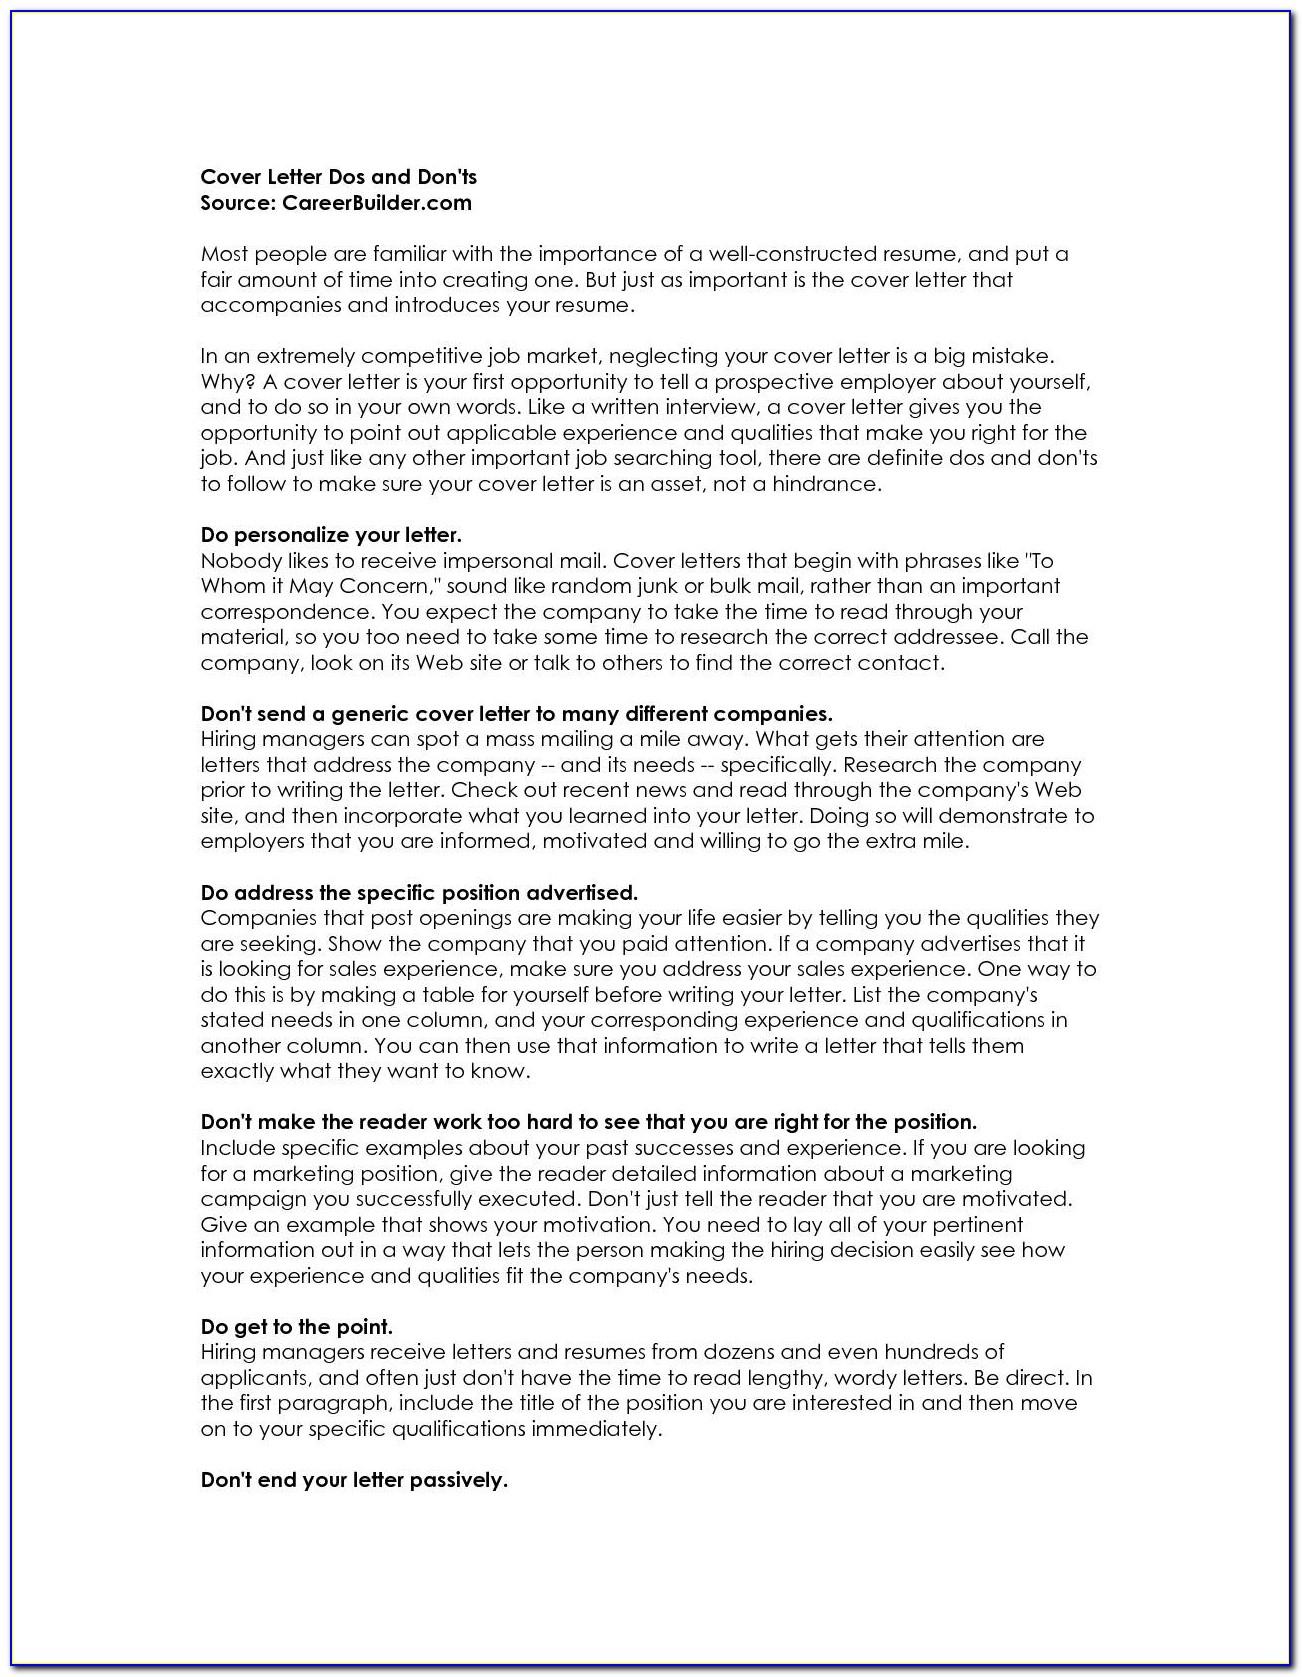 Resume Builder Career Change